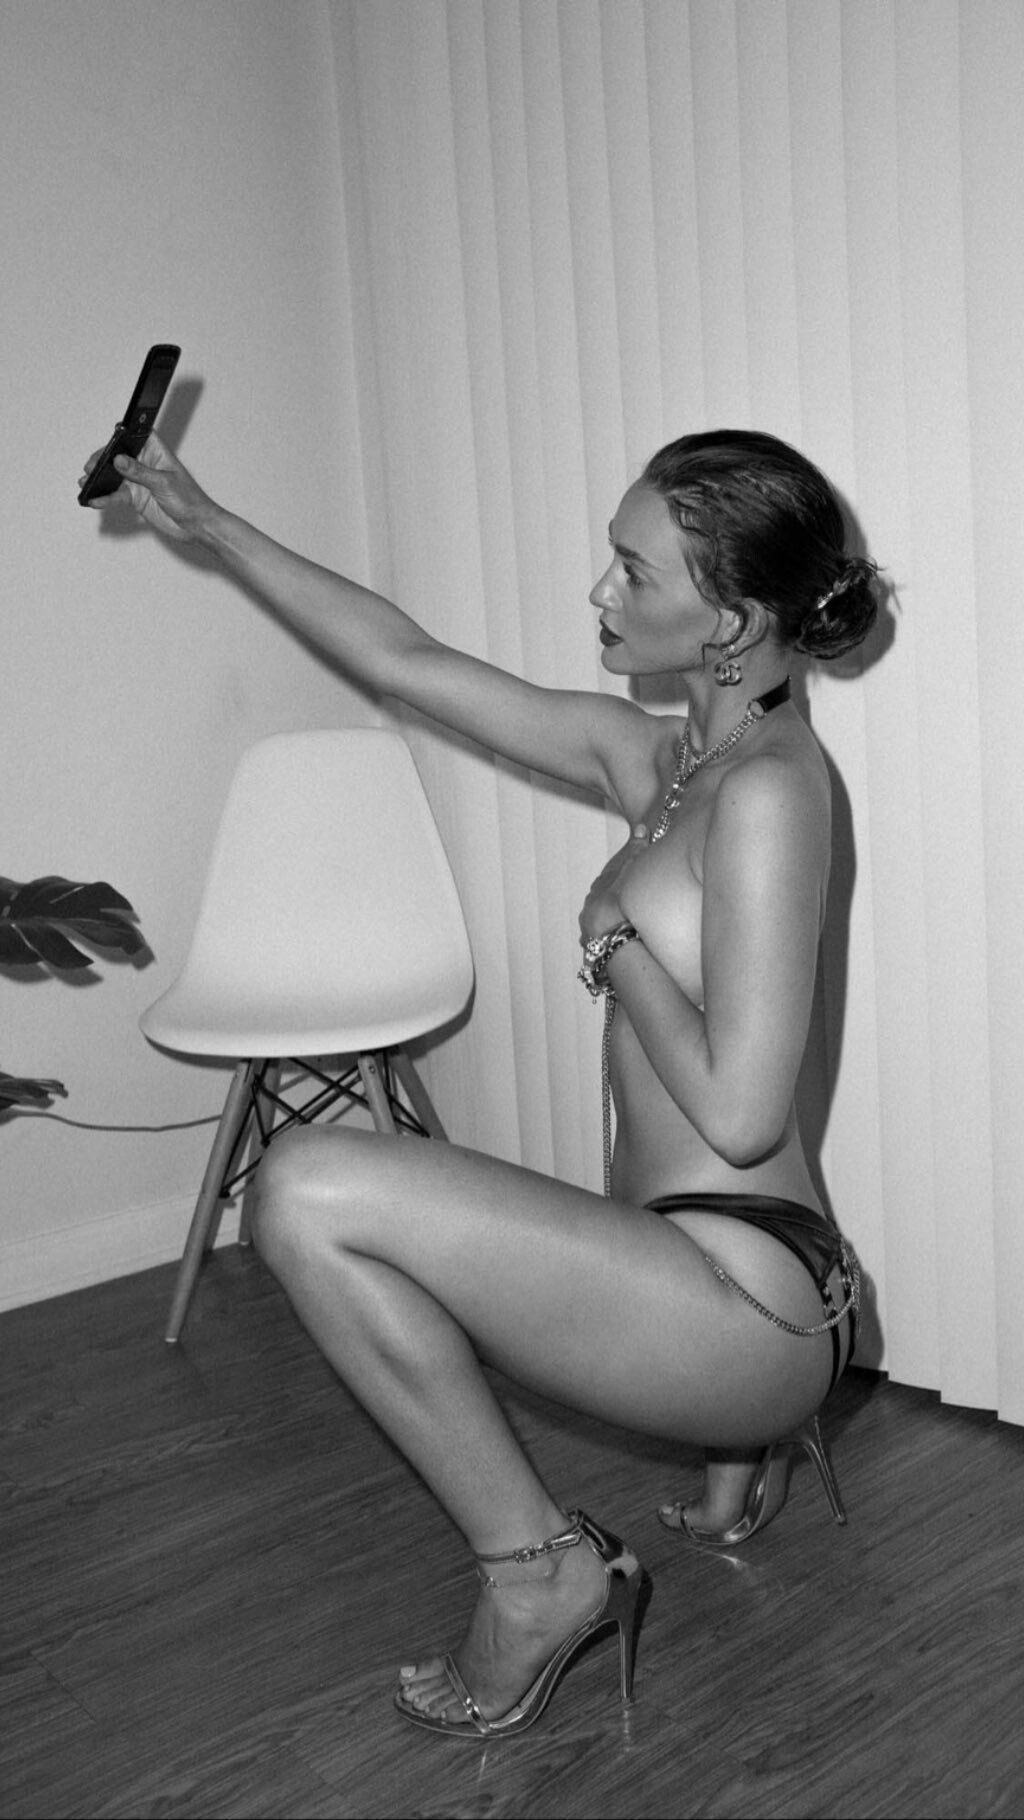 Jordyn Johnson Nude Sexy Thefappeningblog Com 89 1024x1820